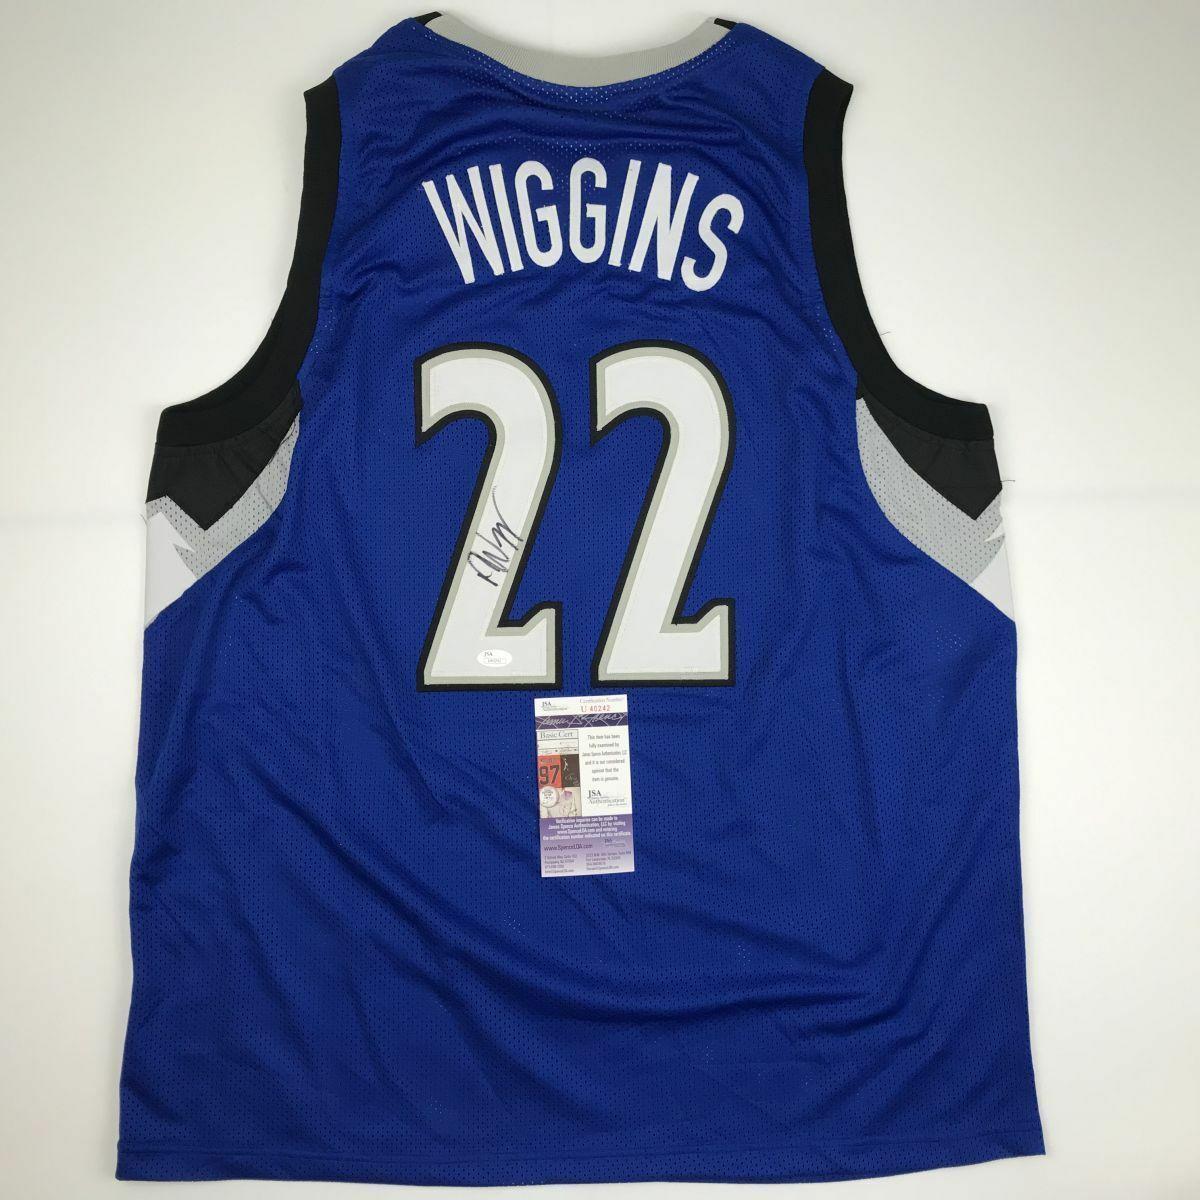 Autographed/Signed ANDREW WIGGINS Minnesota Blue Basketball Jersey JSA COA Auto